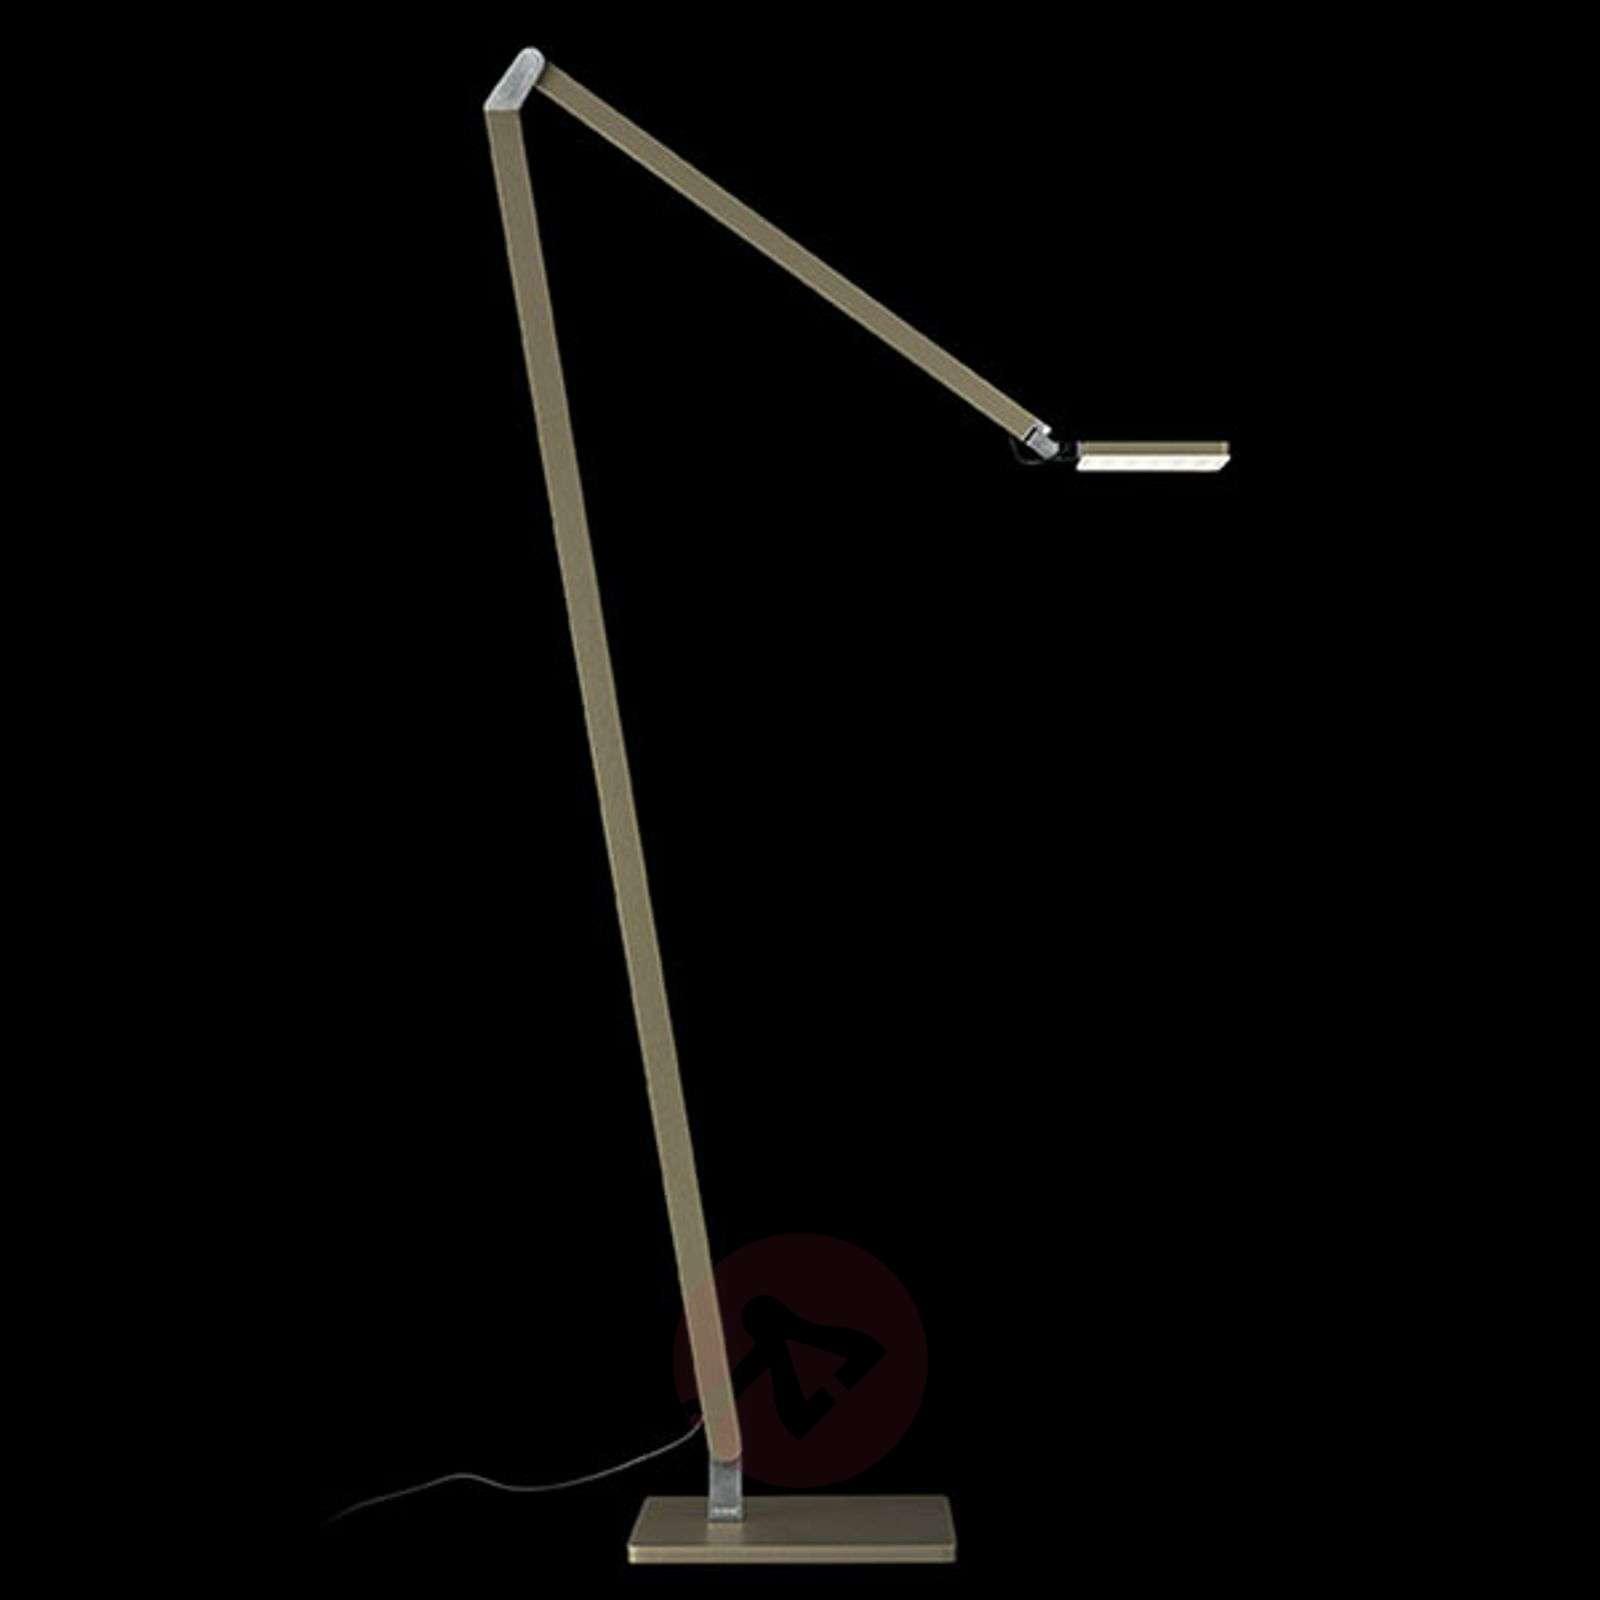 Nimbus Roxxane Home LED-lukuvalaisin-7018004X-01